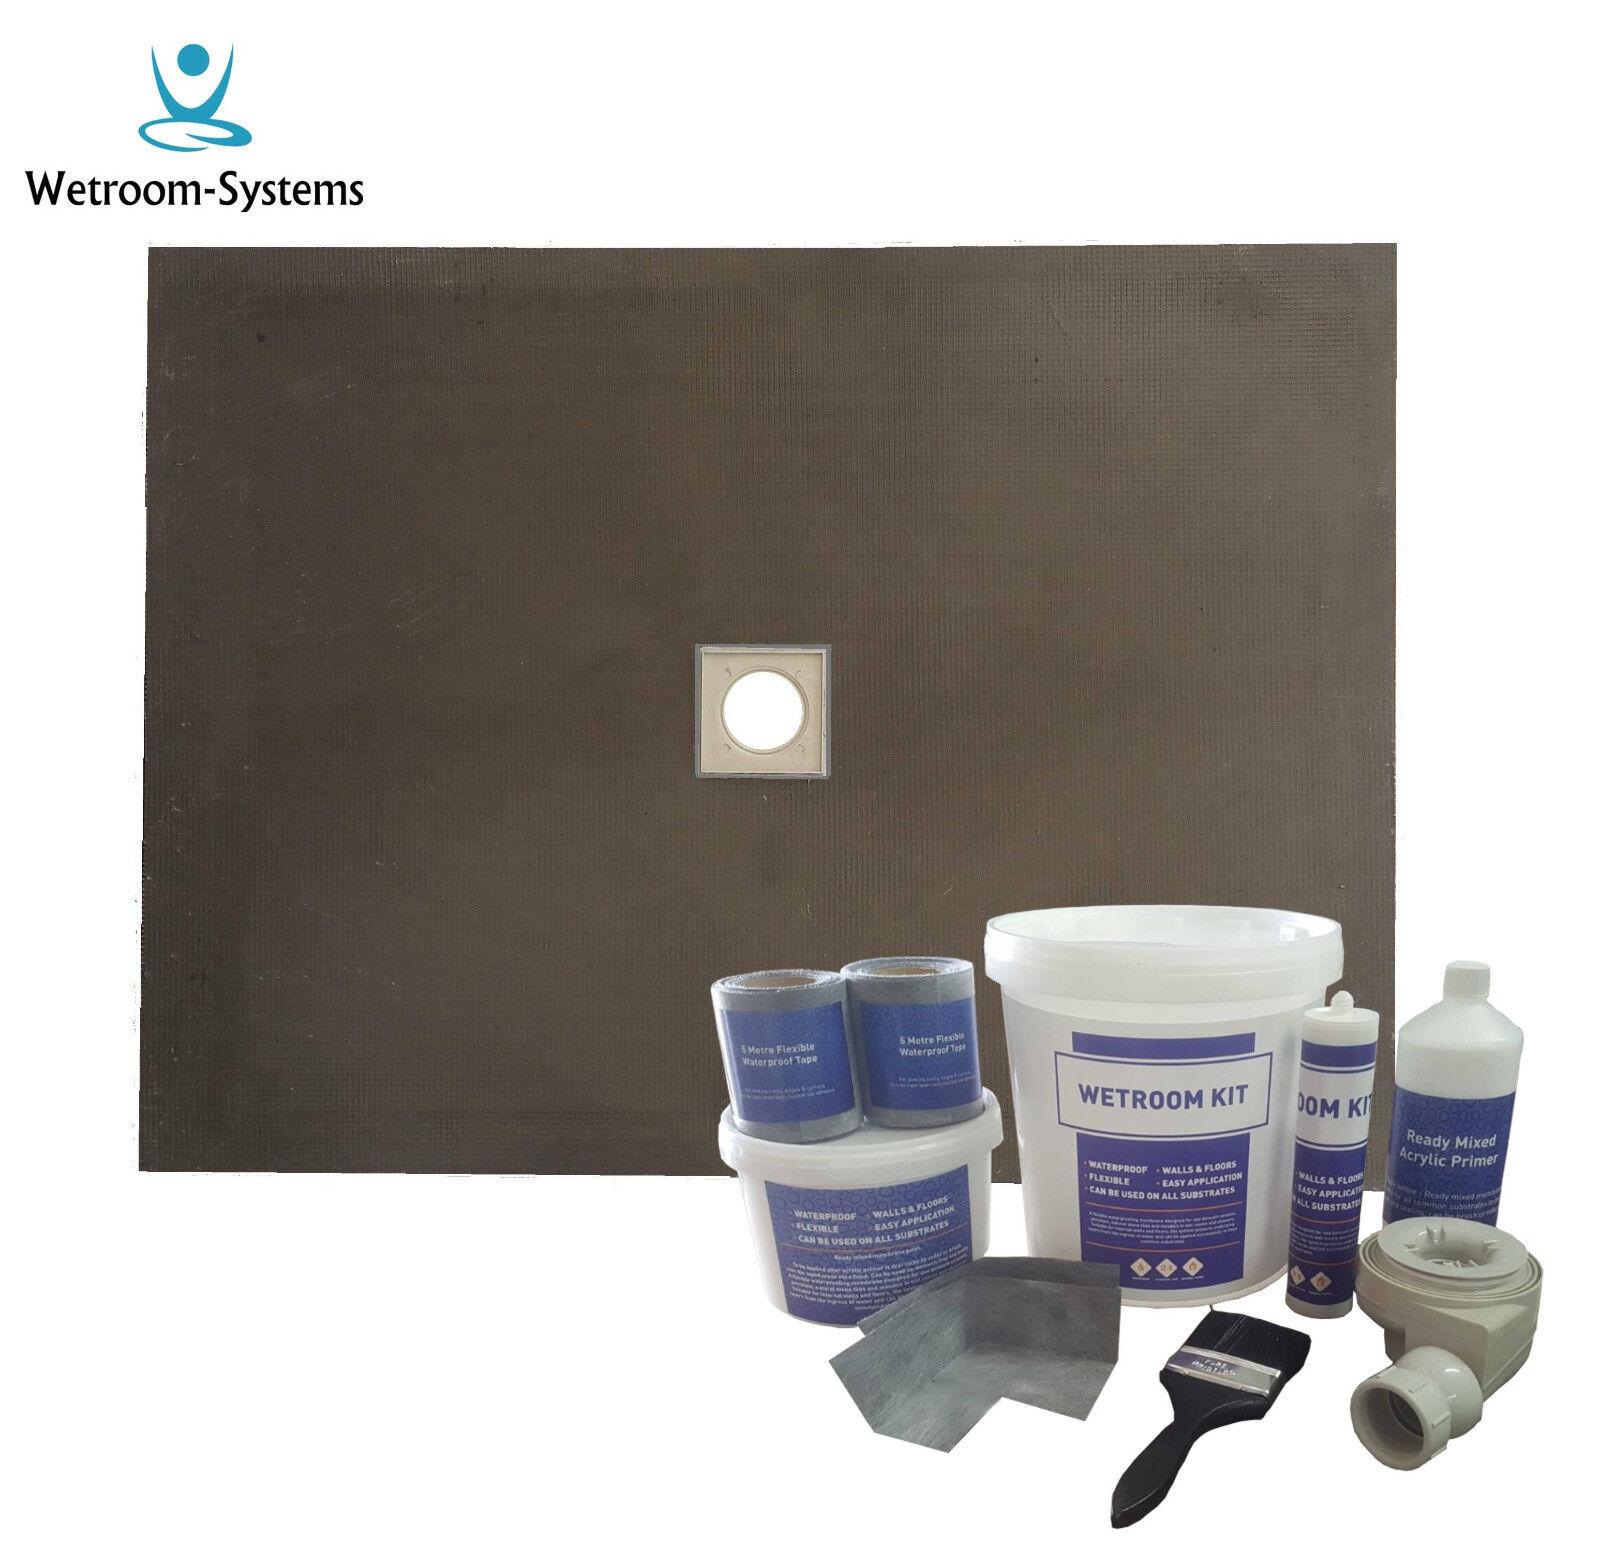 Espacio húmedo con & Kit De Cubiertas 1000 X 1000 X 20mm plato de ducha base & Tanque kit (N B)